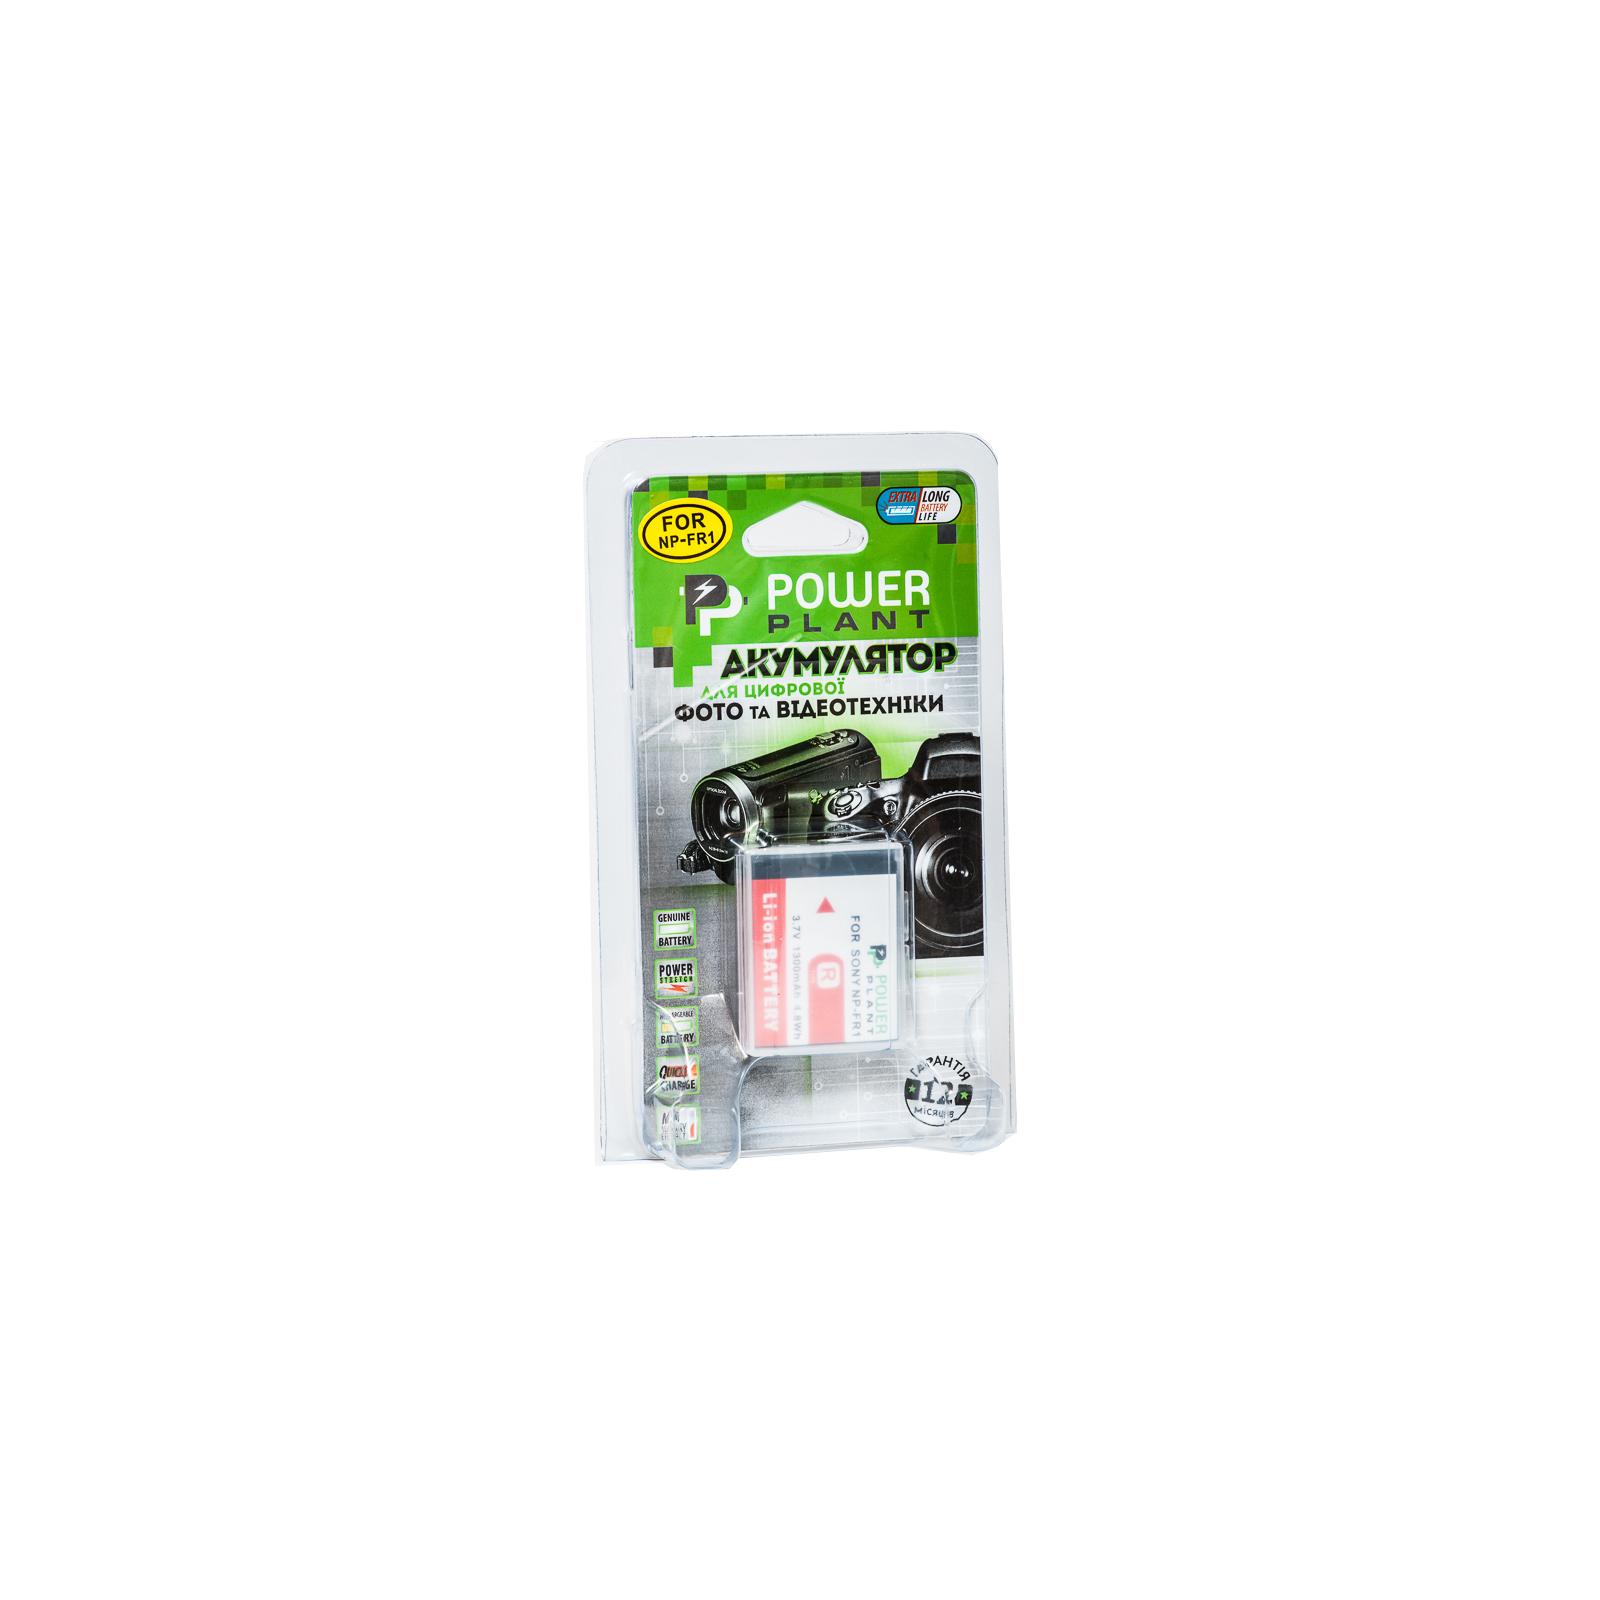 Аккумулятор к фото/видео PowerPlant Sony NP-FR1 (DV00DV1021) изображение 3